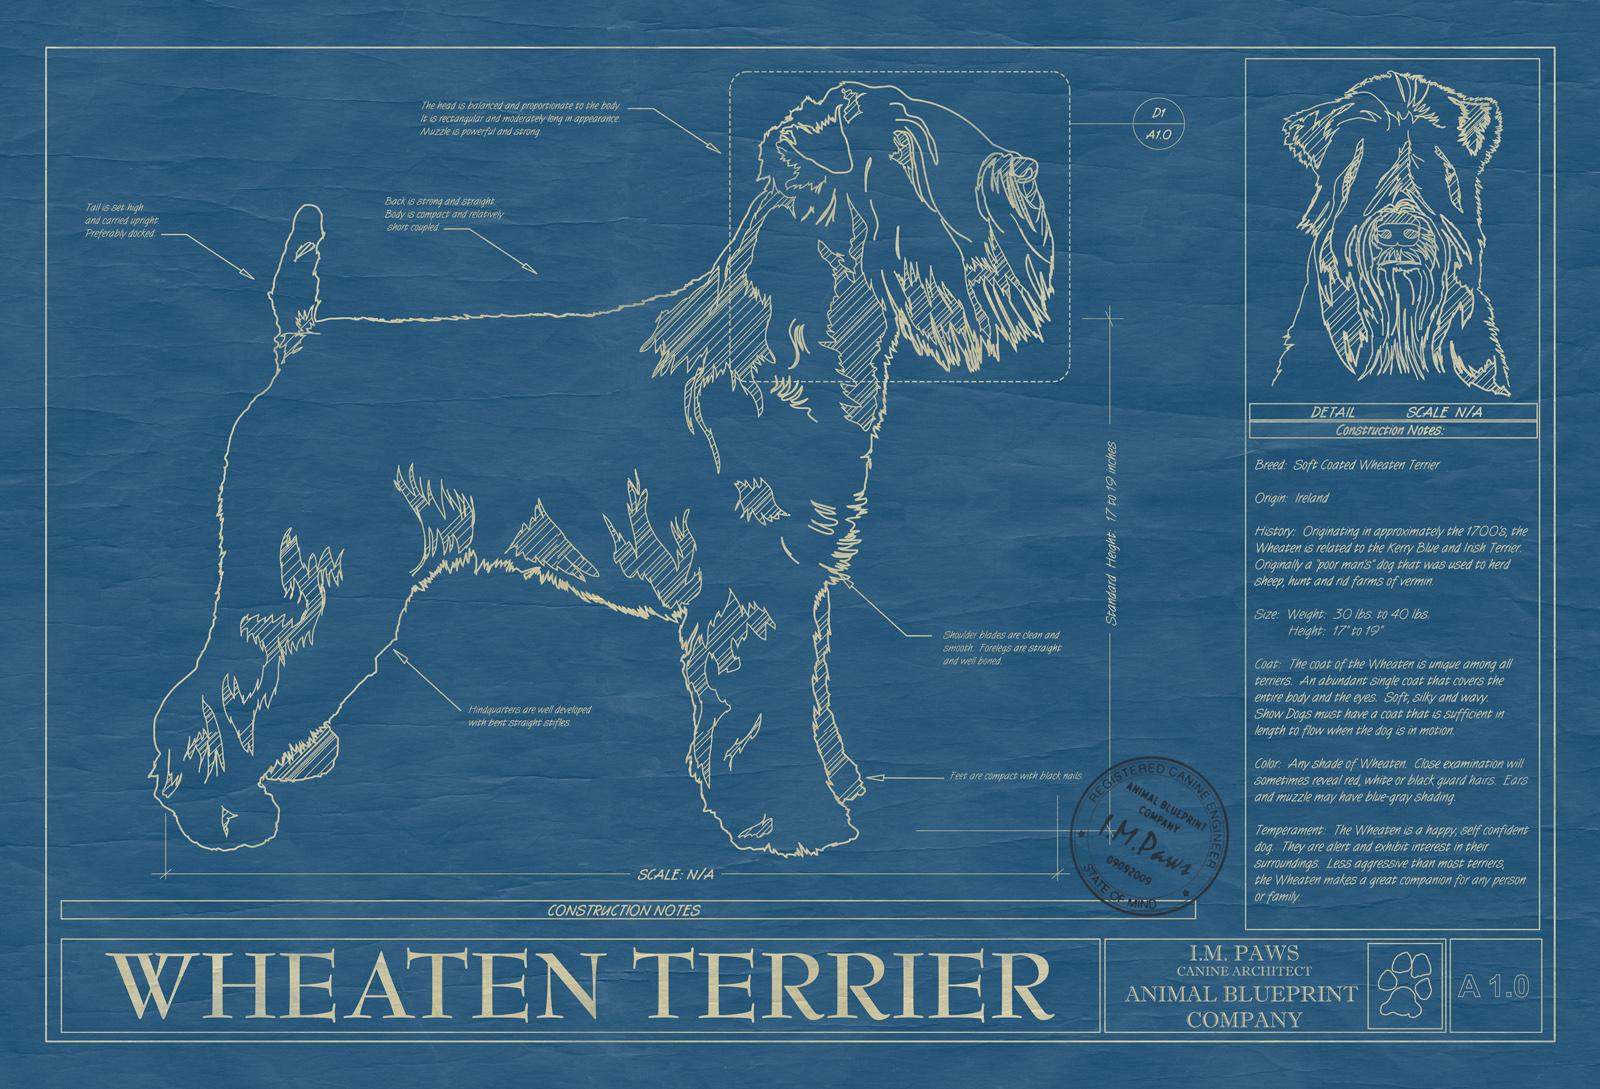 Wheaten terrier animal blueprint company wheaten terrier dog blueprint malvernweather Choice Image